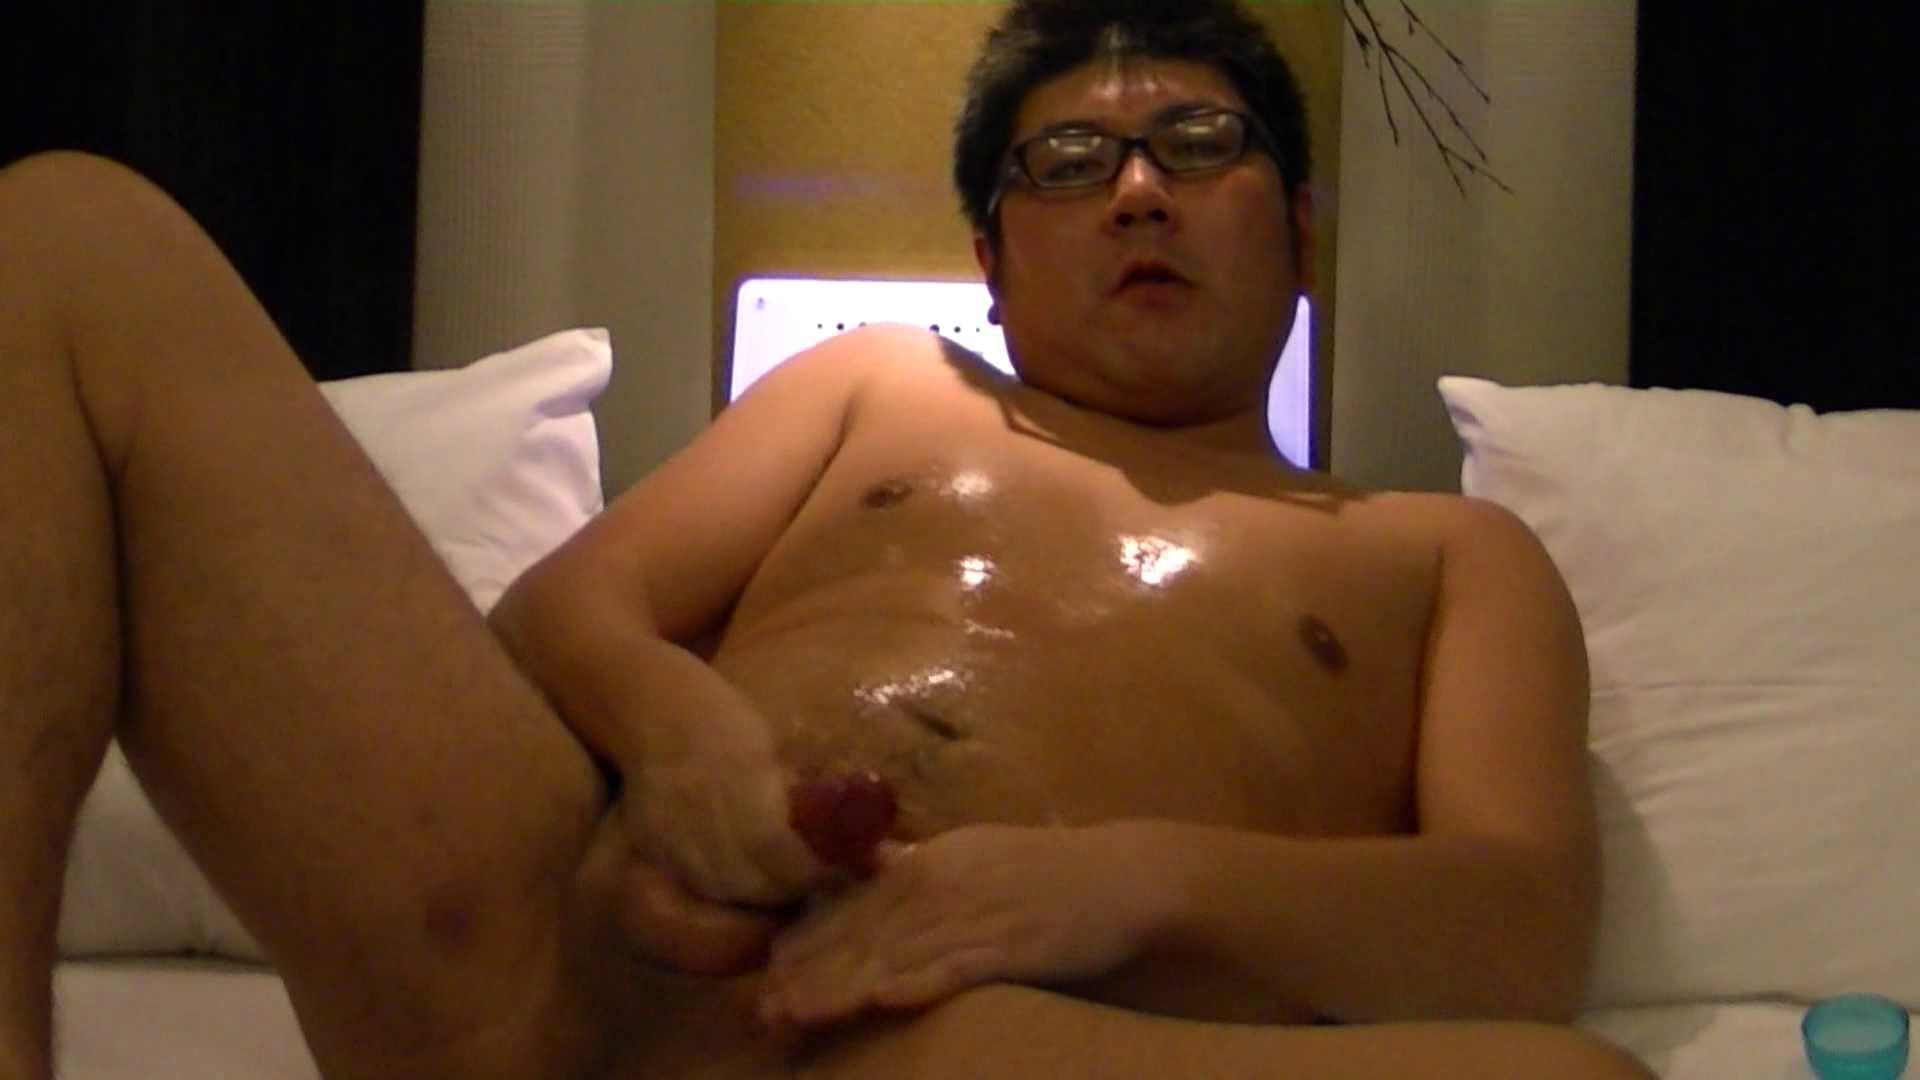 Mr.オナックスさん投稿!HD 貴方のオナニー三万円で撮影させてください。VOL.03 後編 完全無修正版  106枚 54